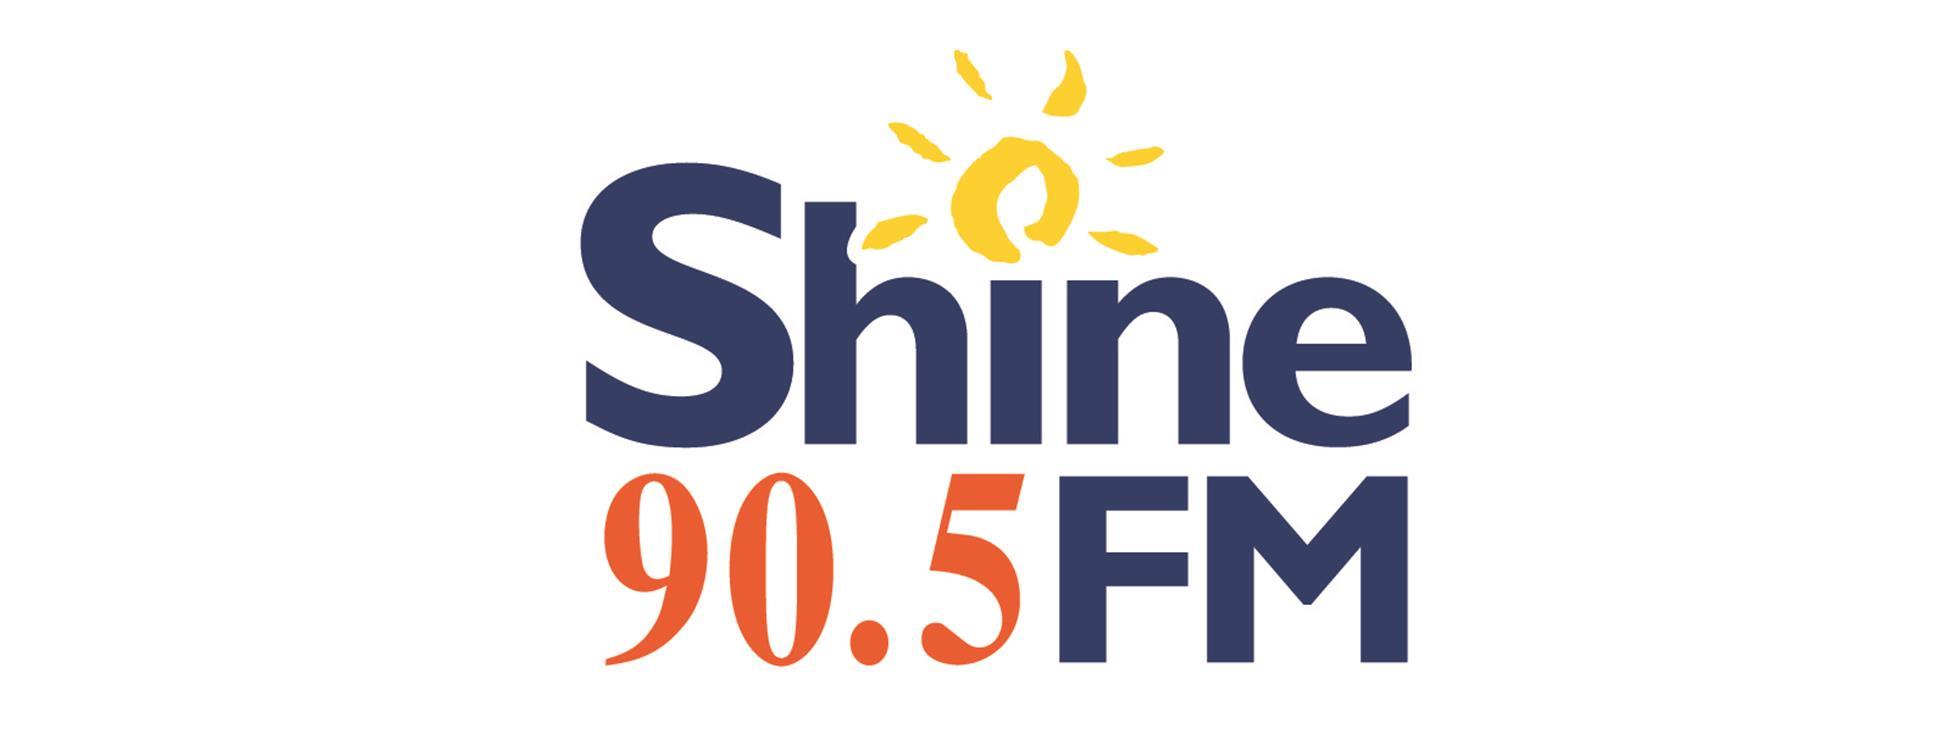 SS-Shine